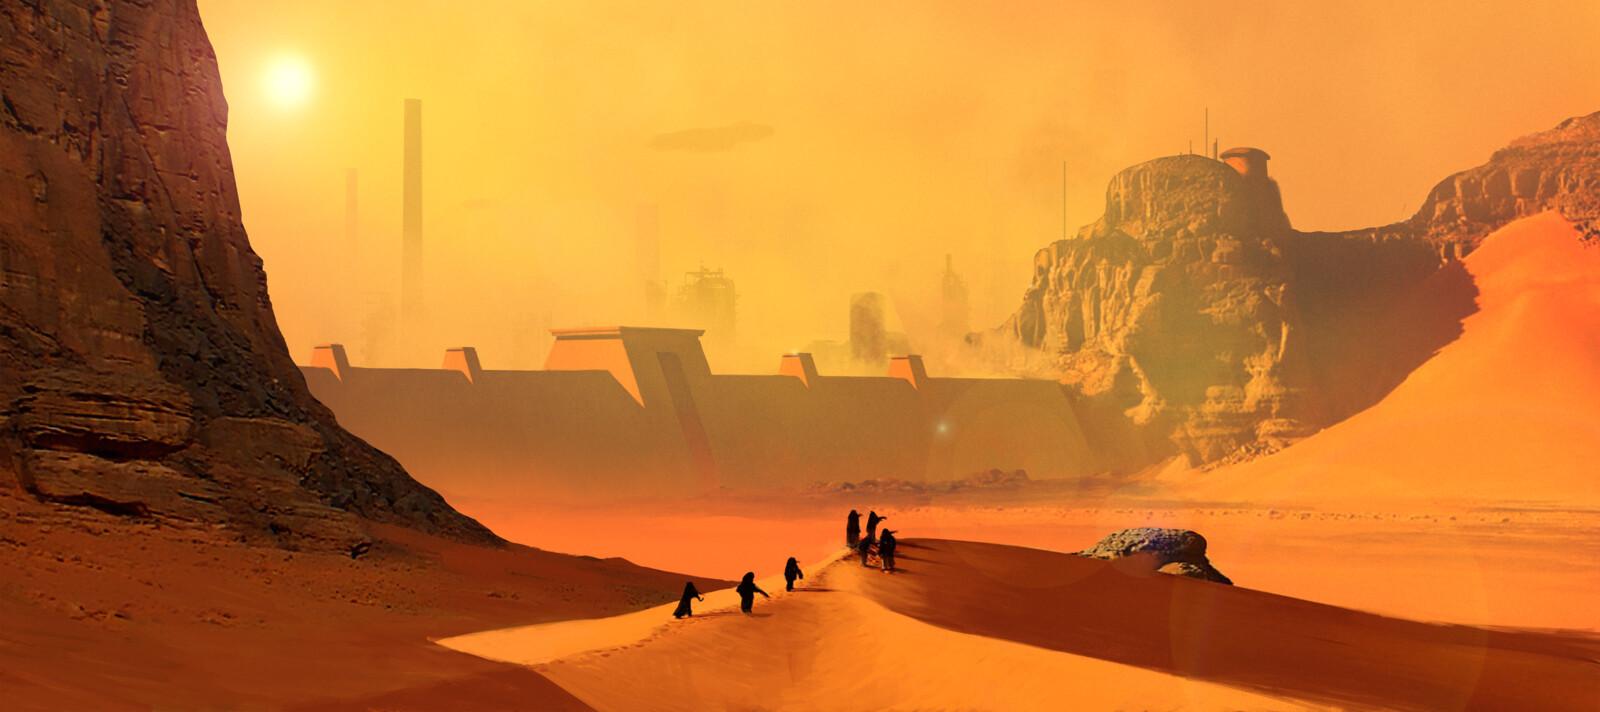 Arrakis Shield Wall